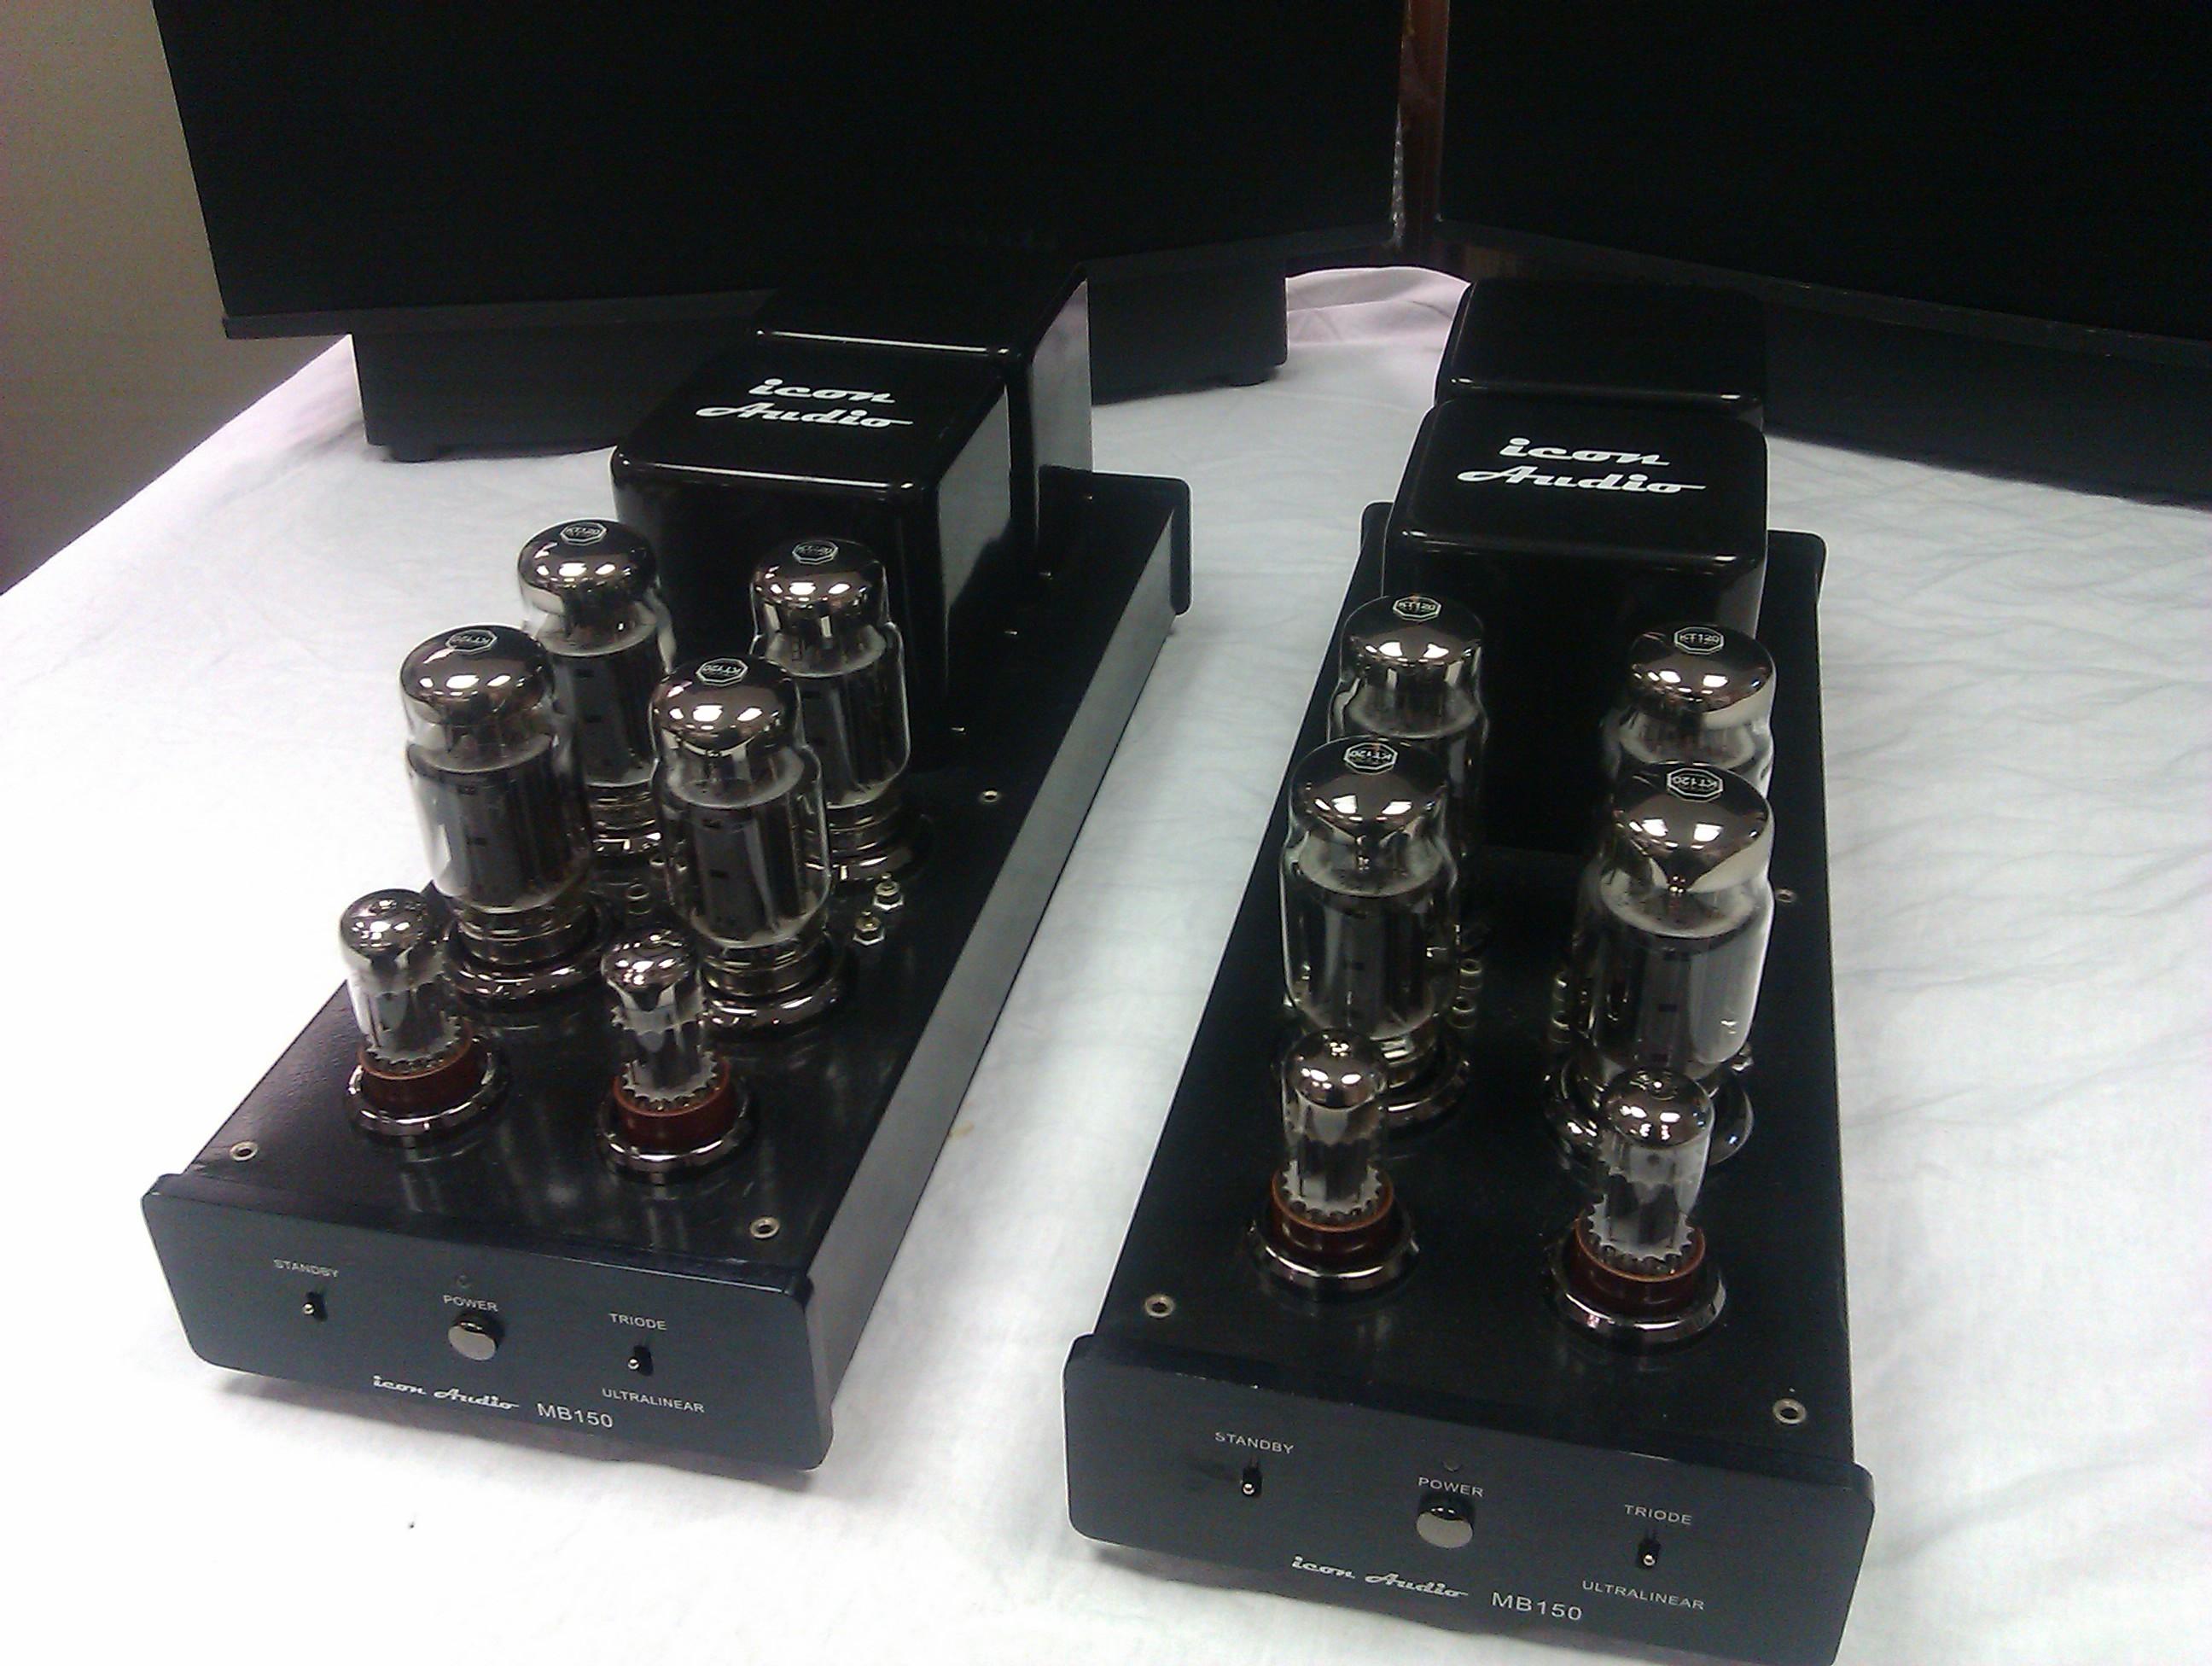 KT88 powered hi-fi delights